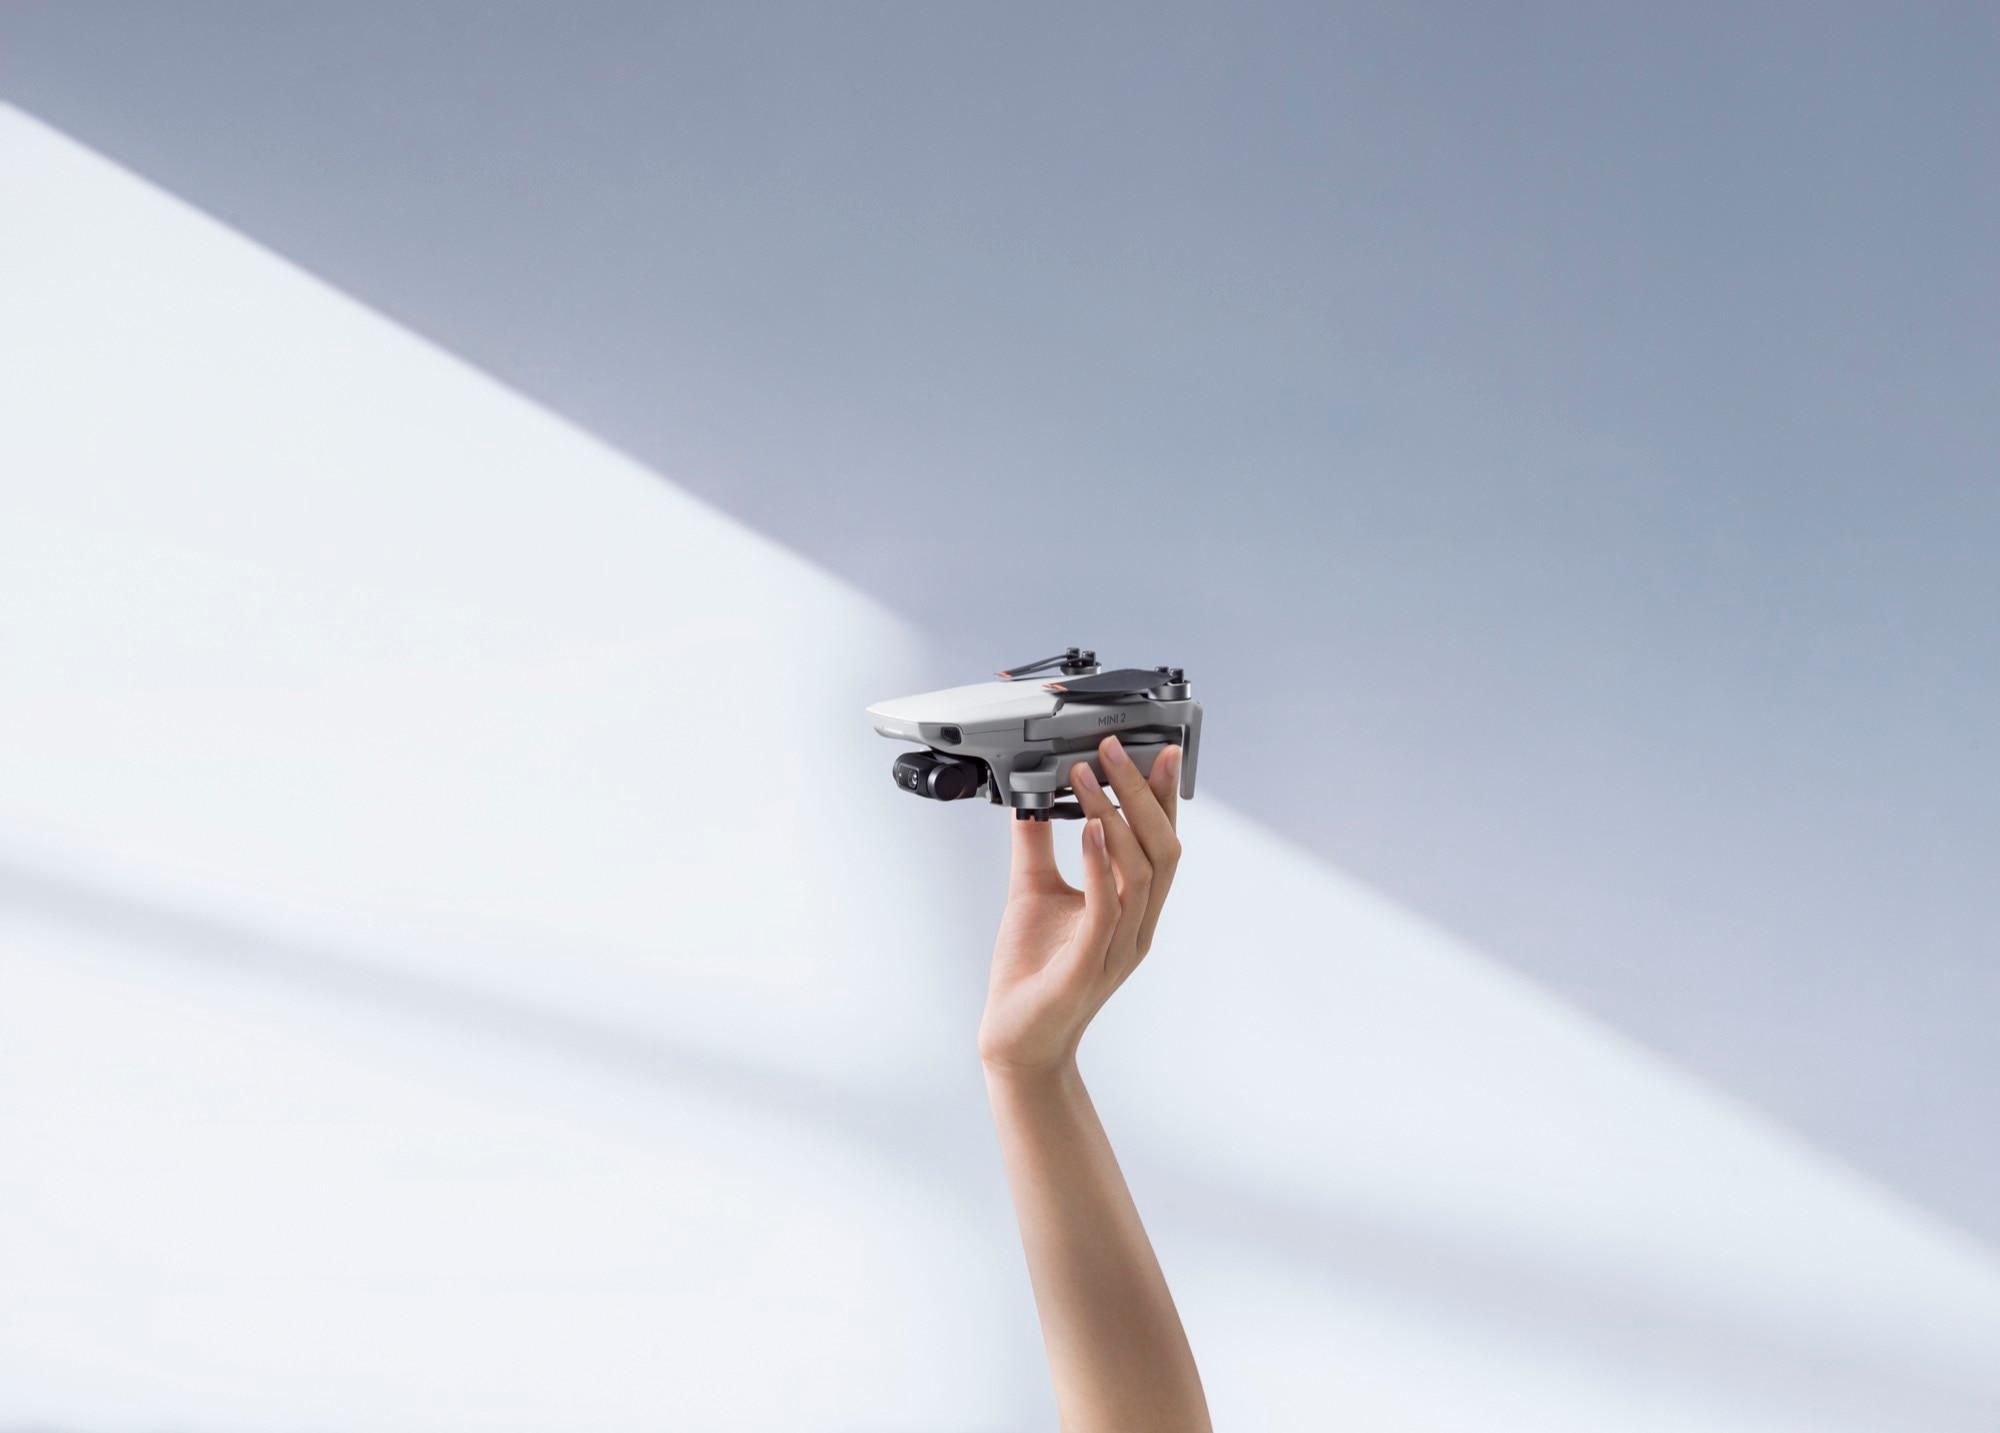 DJI Mini 2 is a 4K camera drone that weighs like a big ...